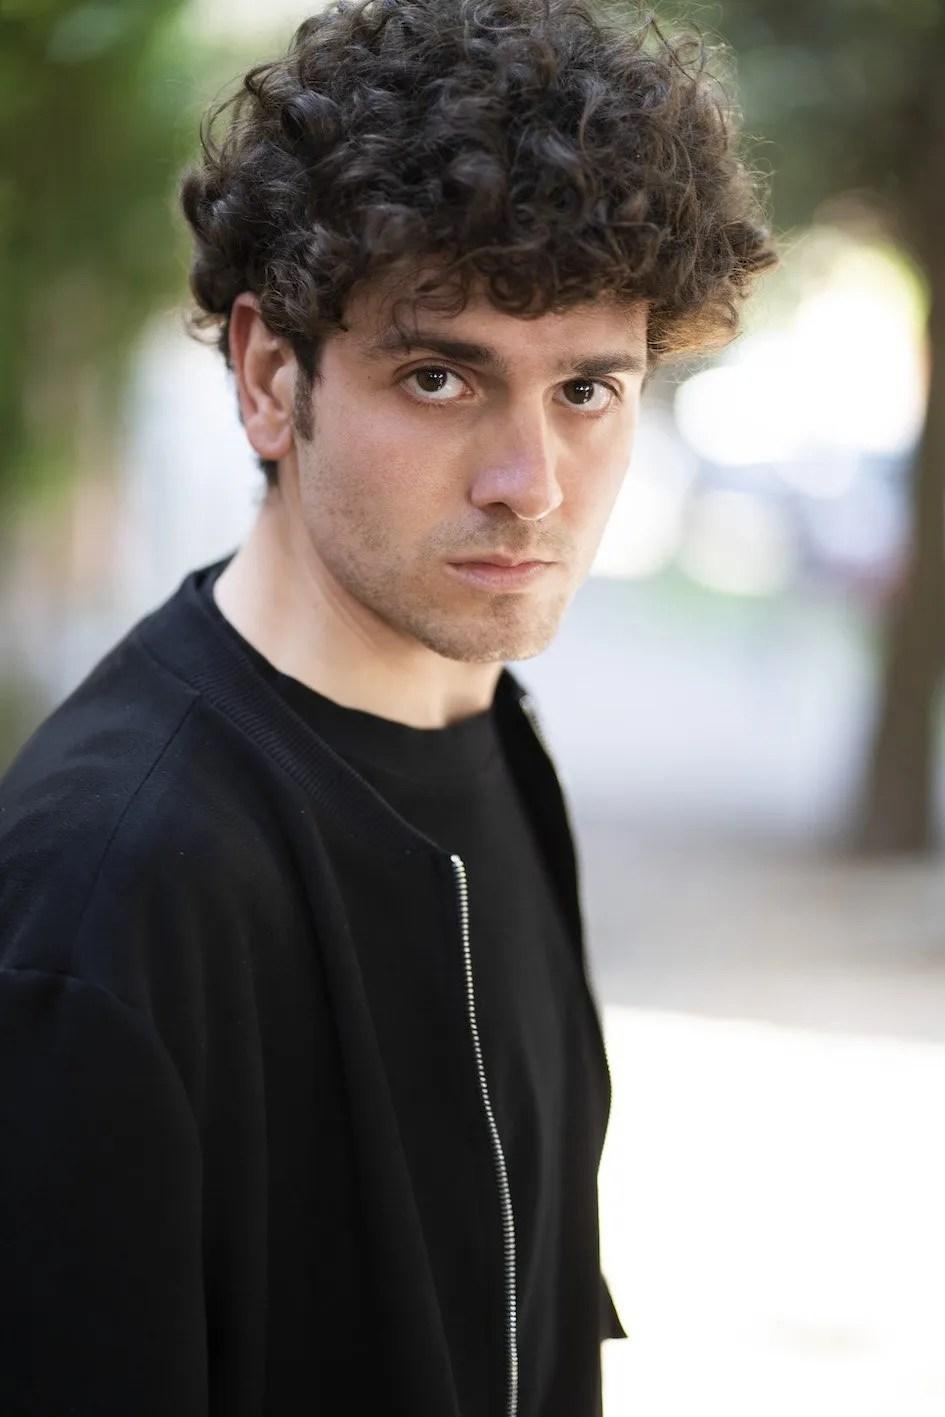 Antonio Carella